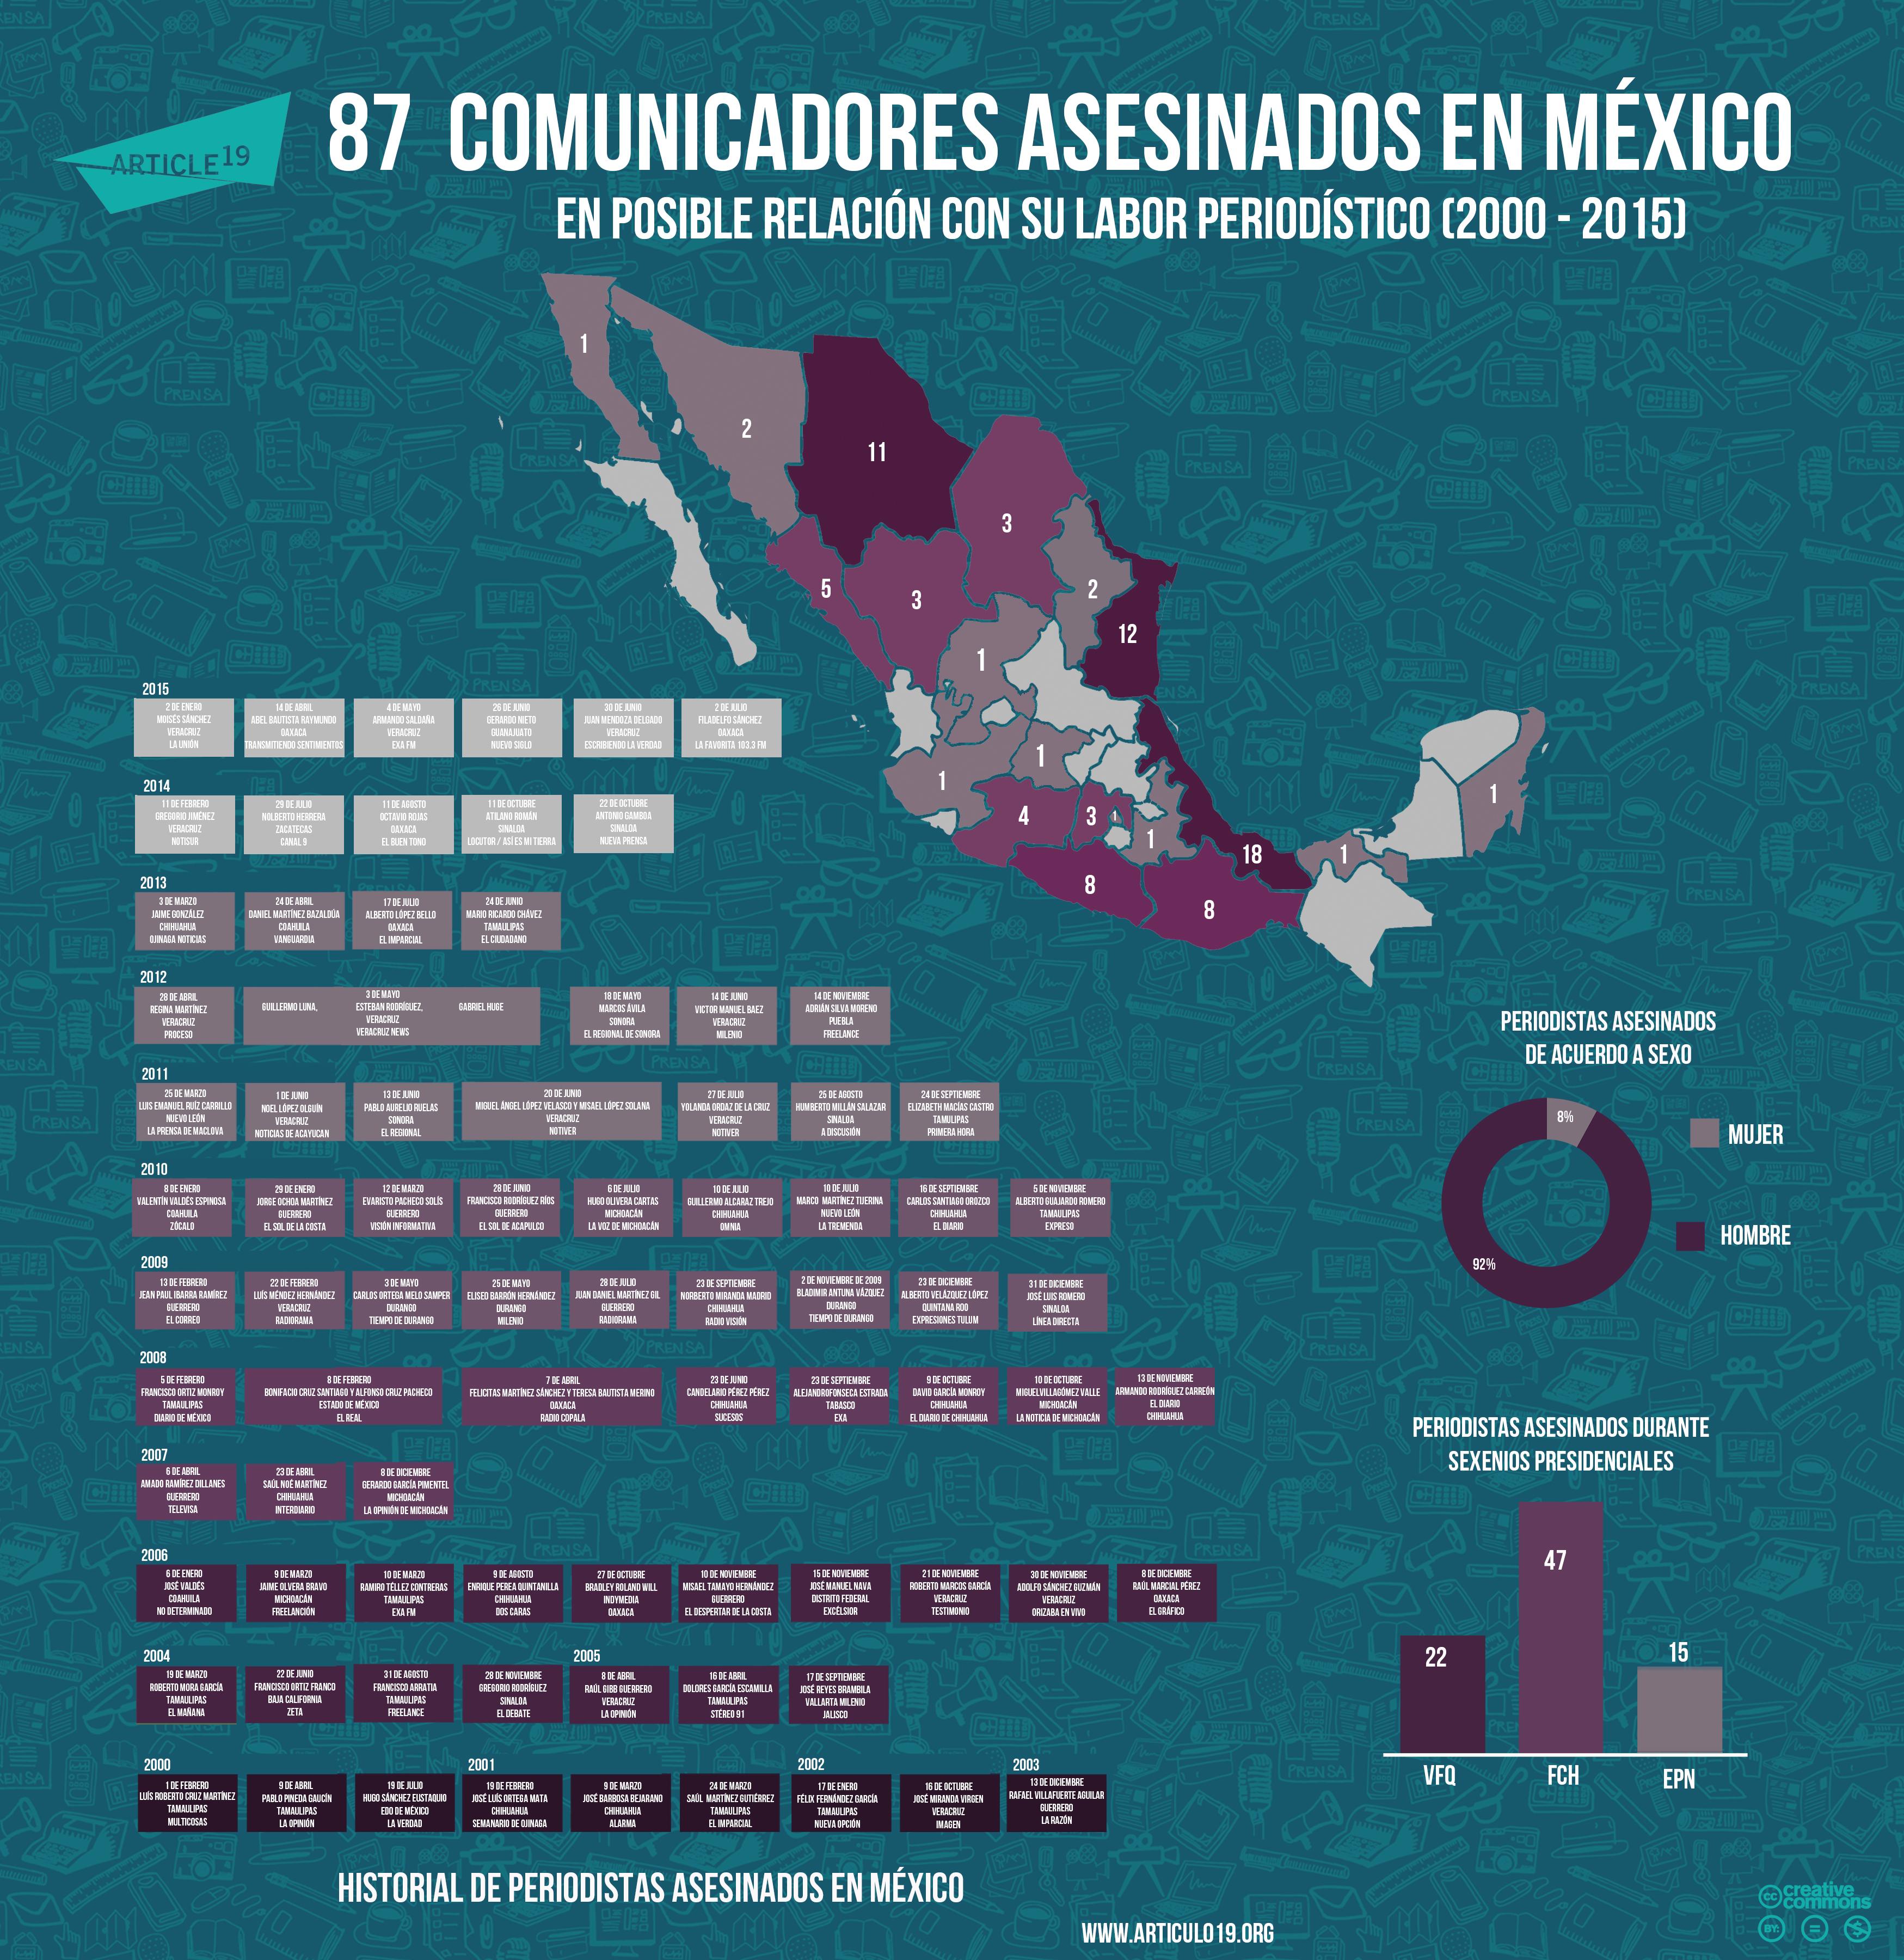 Periodistas asesinados en Mexico (Julio 2015)